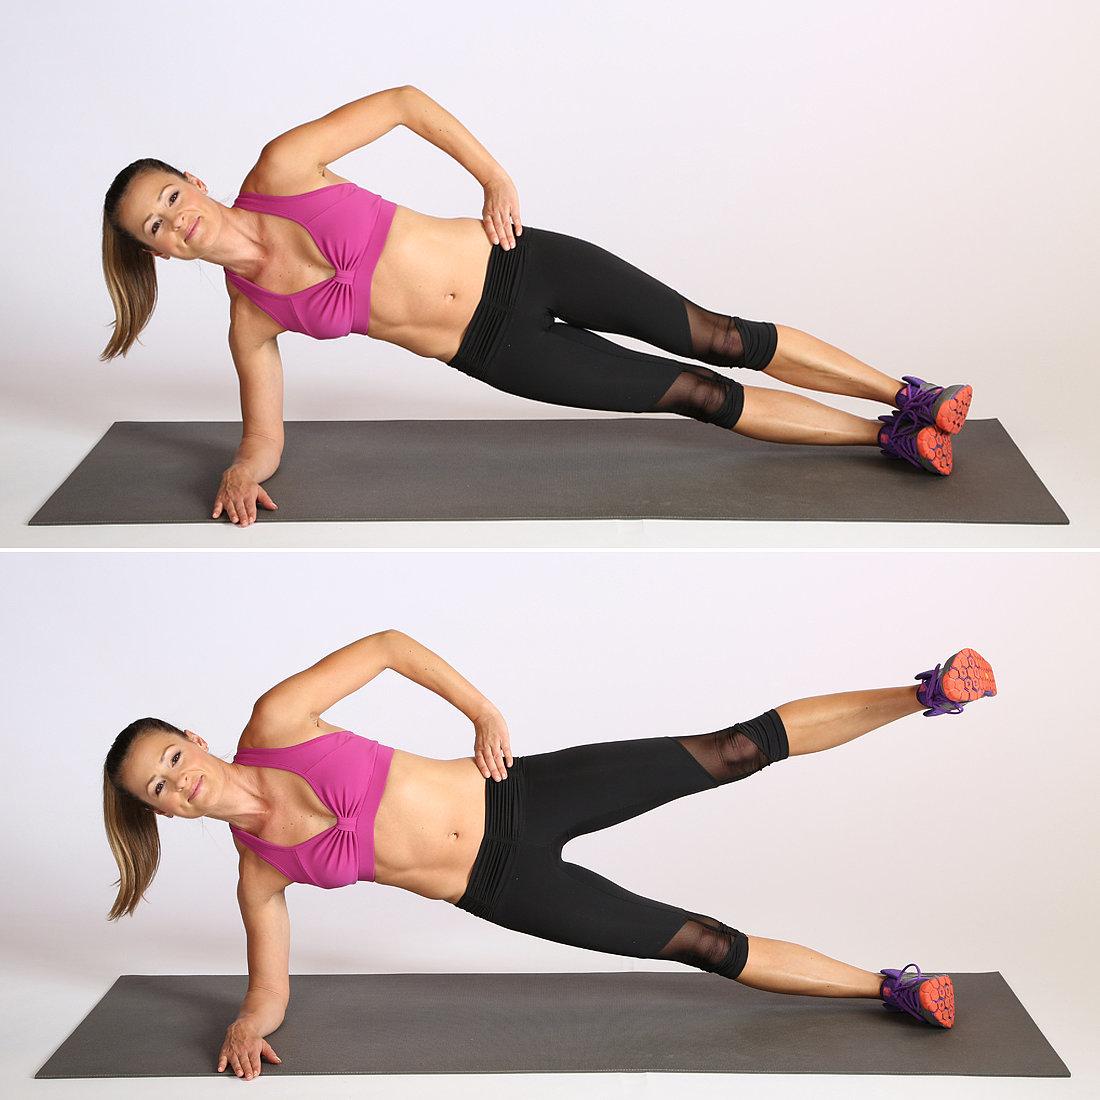 Gymnastics floor exercise